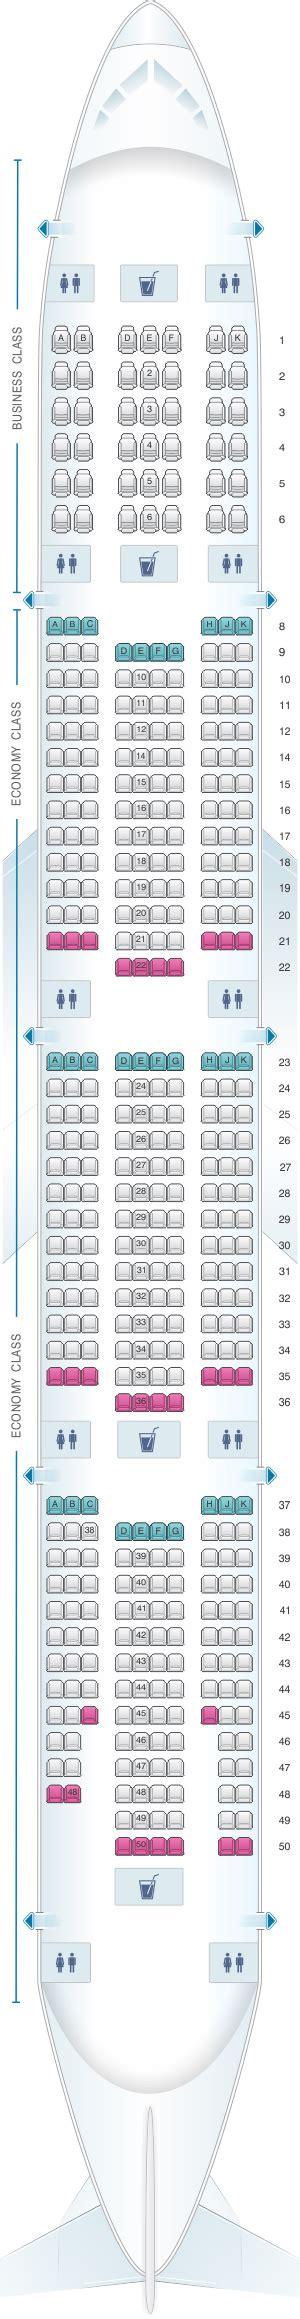 plan siege boeing 777 300er plan de cabine emirates boeing b777 300er two class